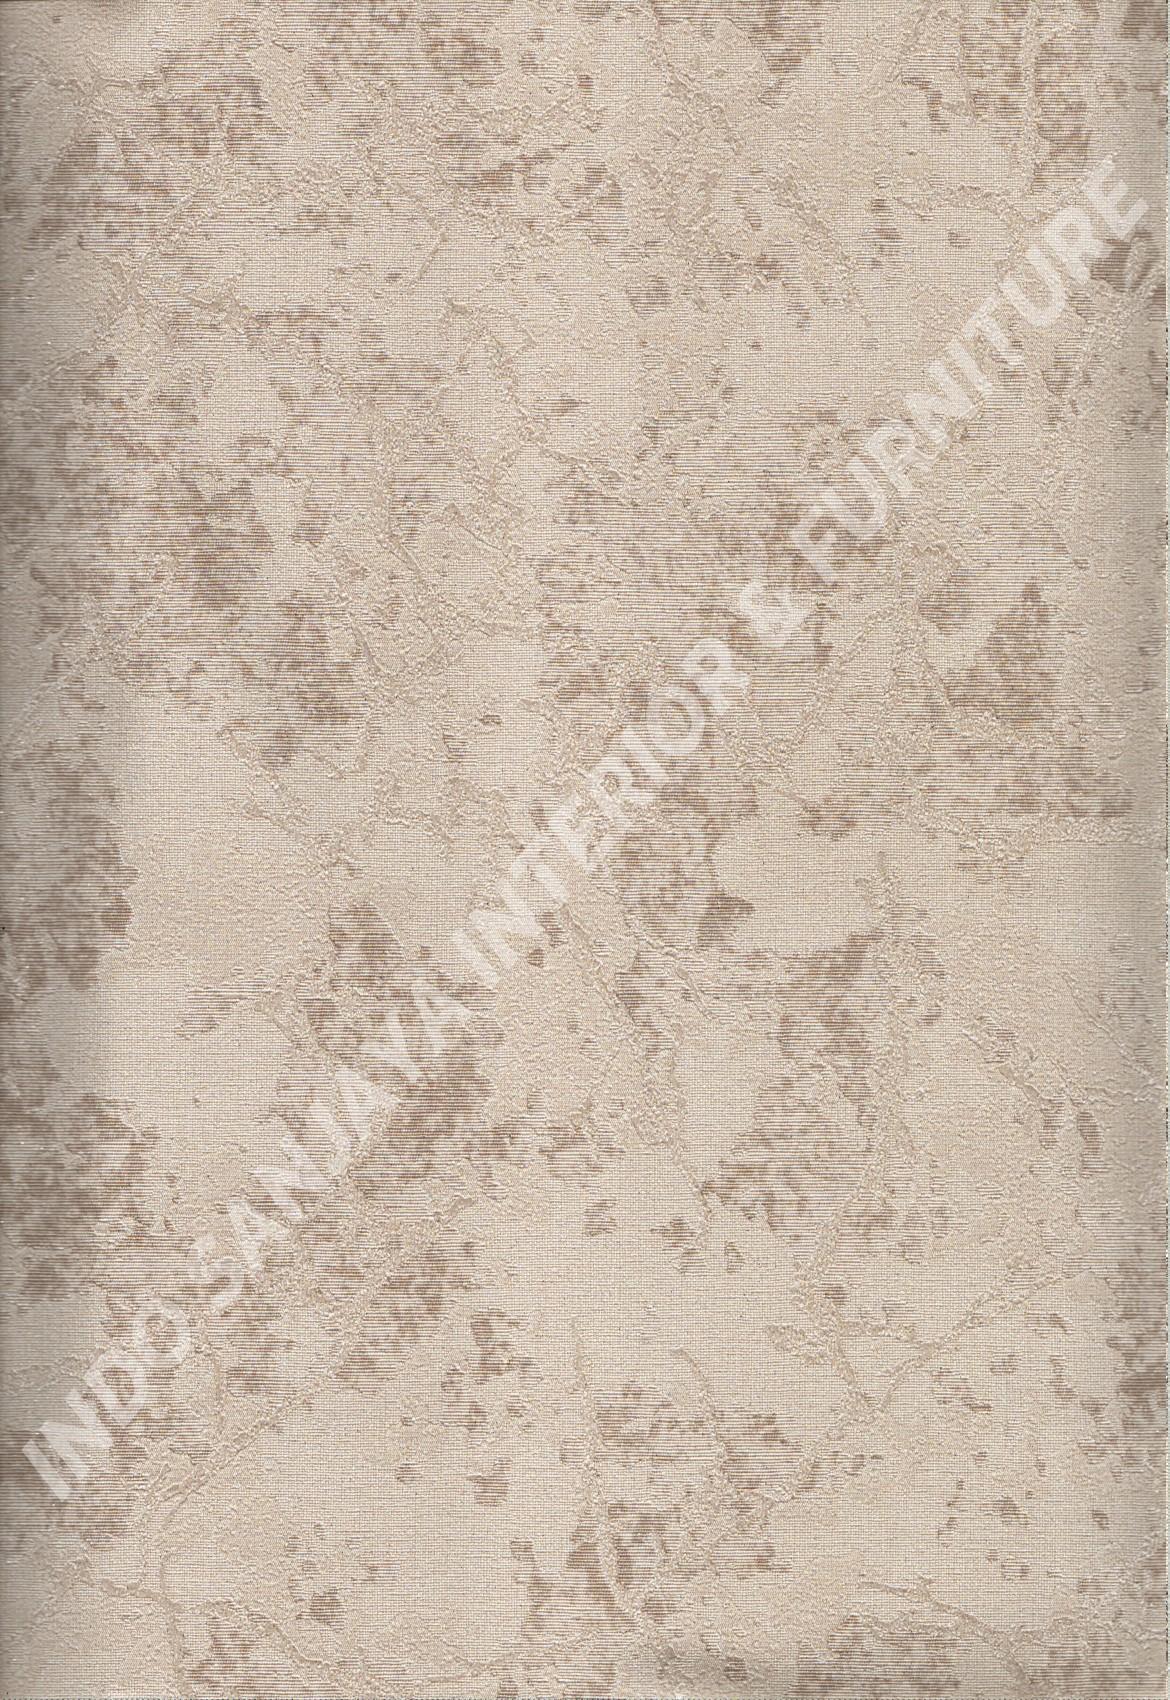 wallpaper   Wallpaper Minimalis Polos 81124-5:81124-5 corak  warna